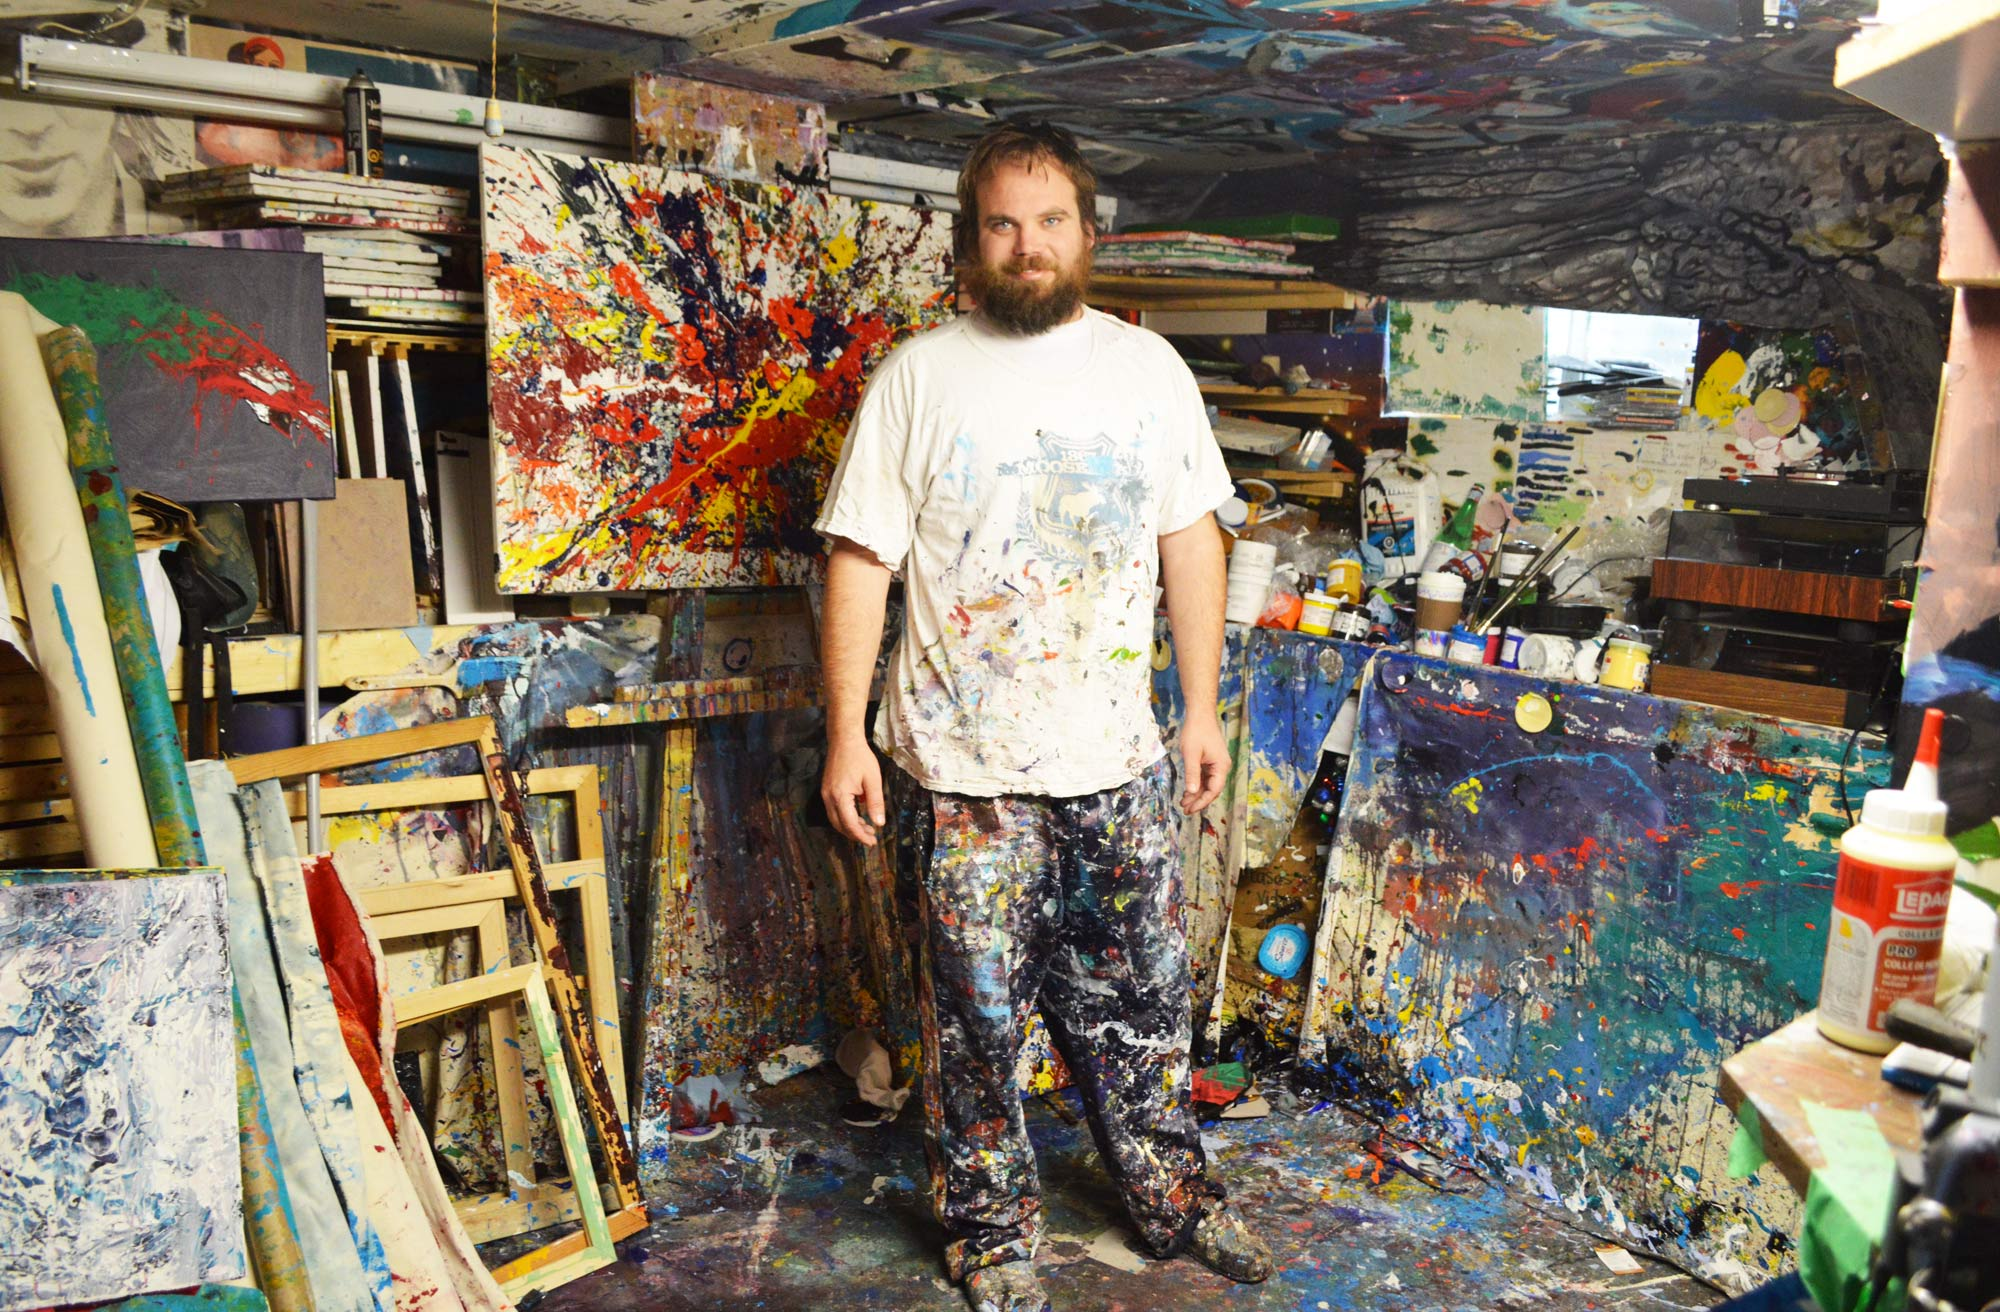 Local artist Jason Kuehnen standing in his basement studio where his creativity is unleashed.